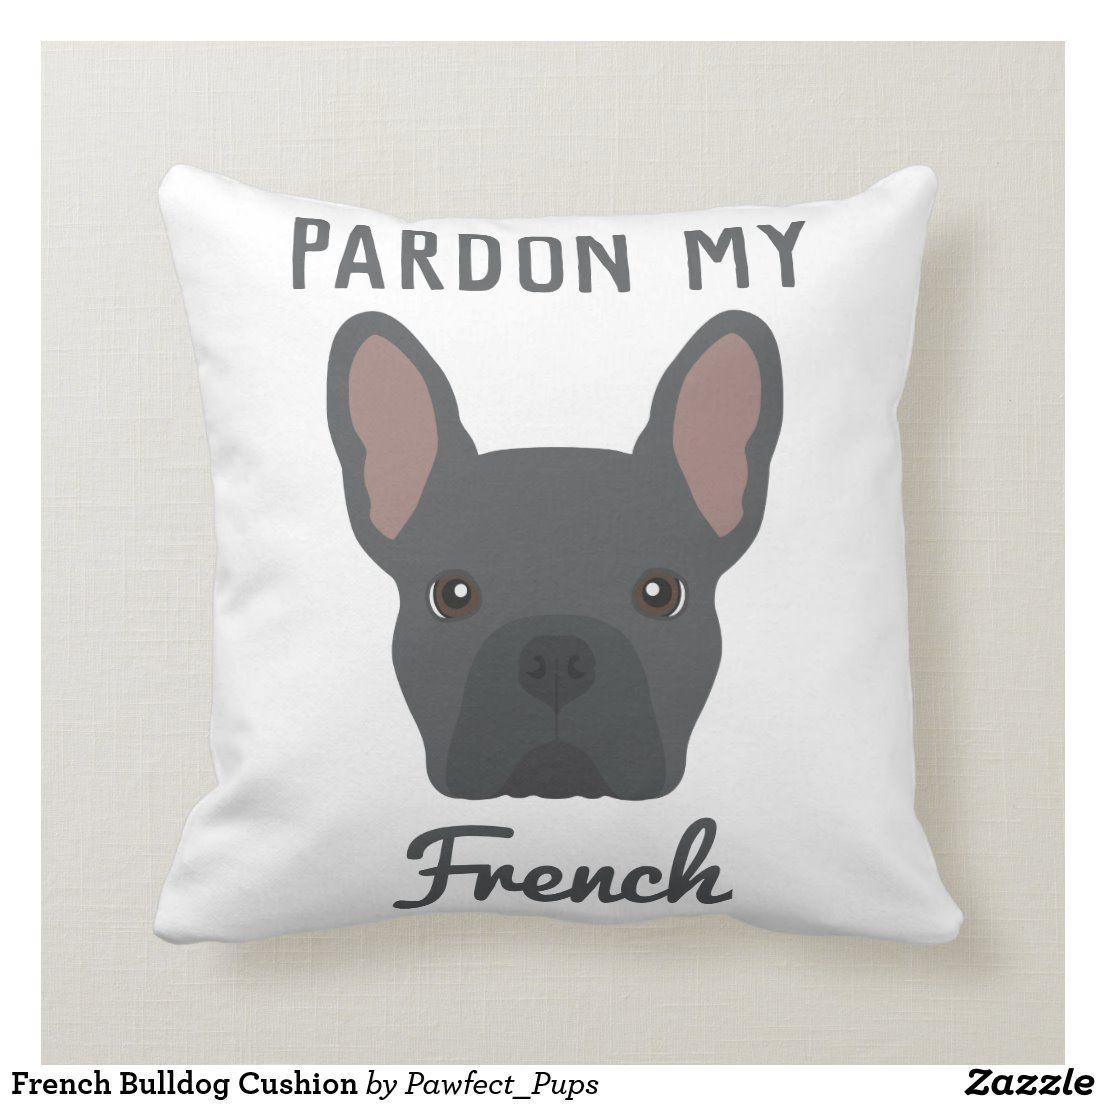 French Bulldog Cushion Zazzle.co.uk in 2020 French